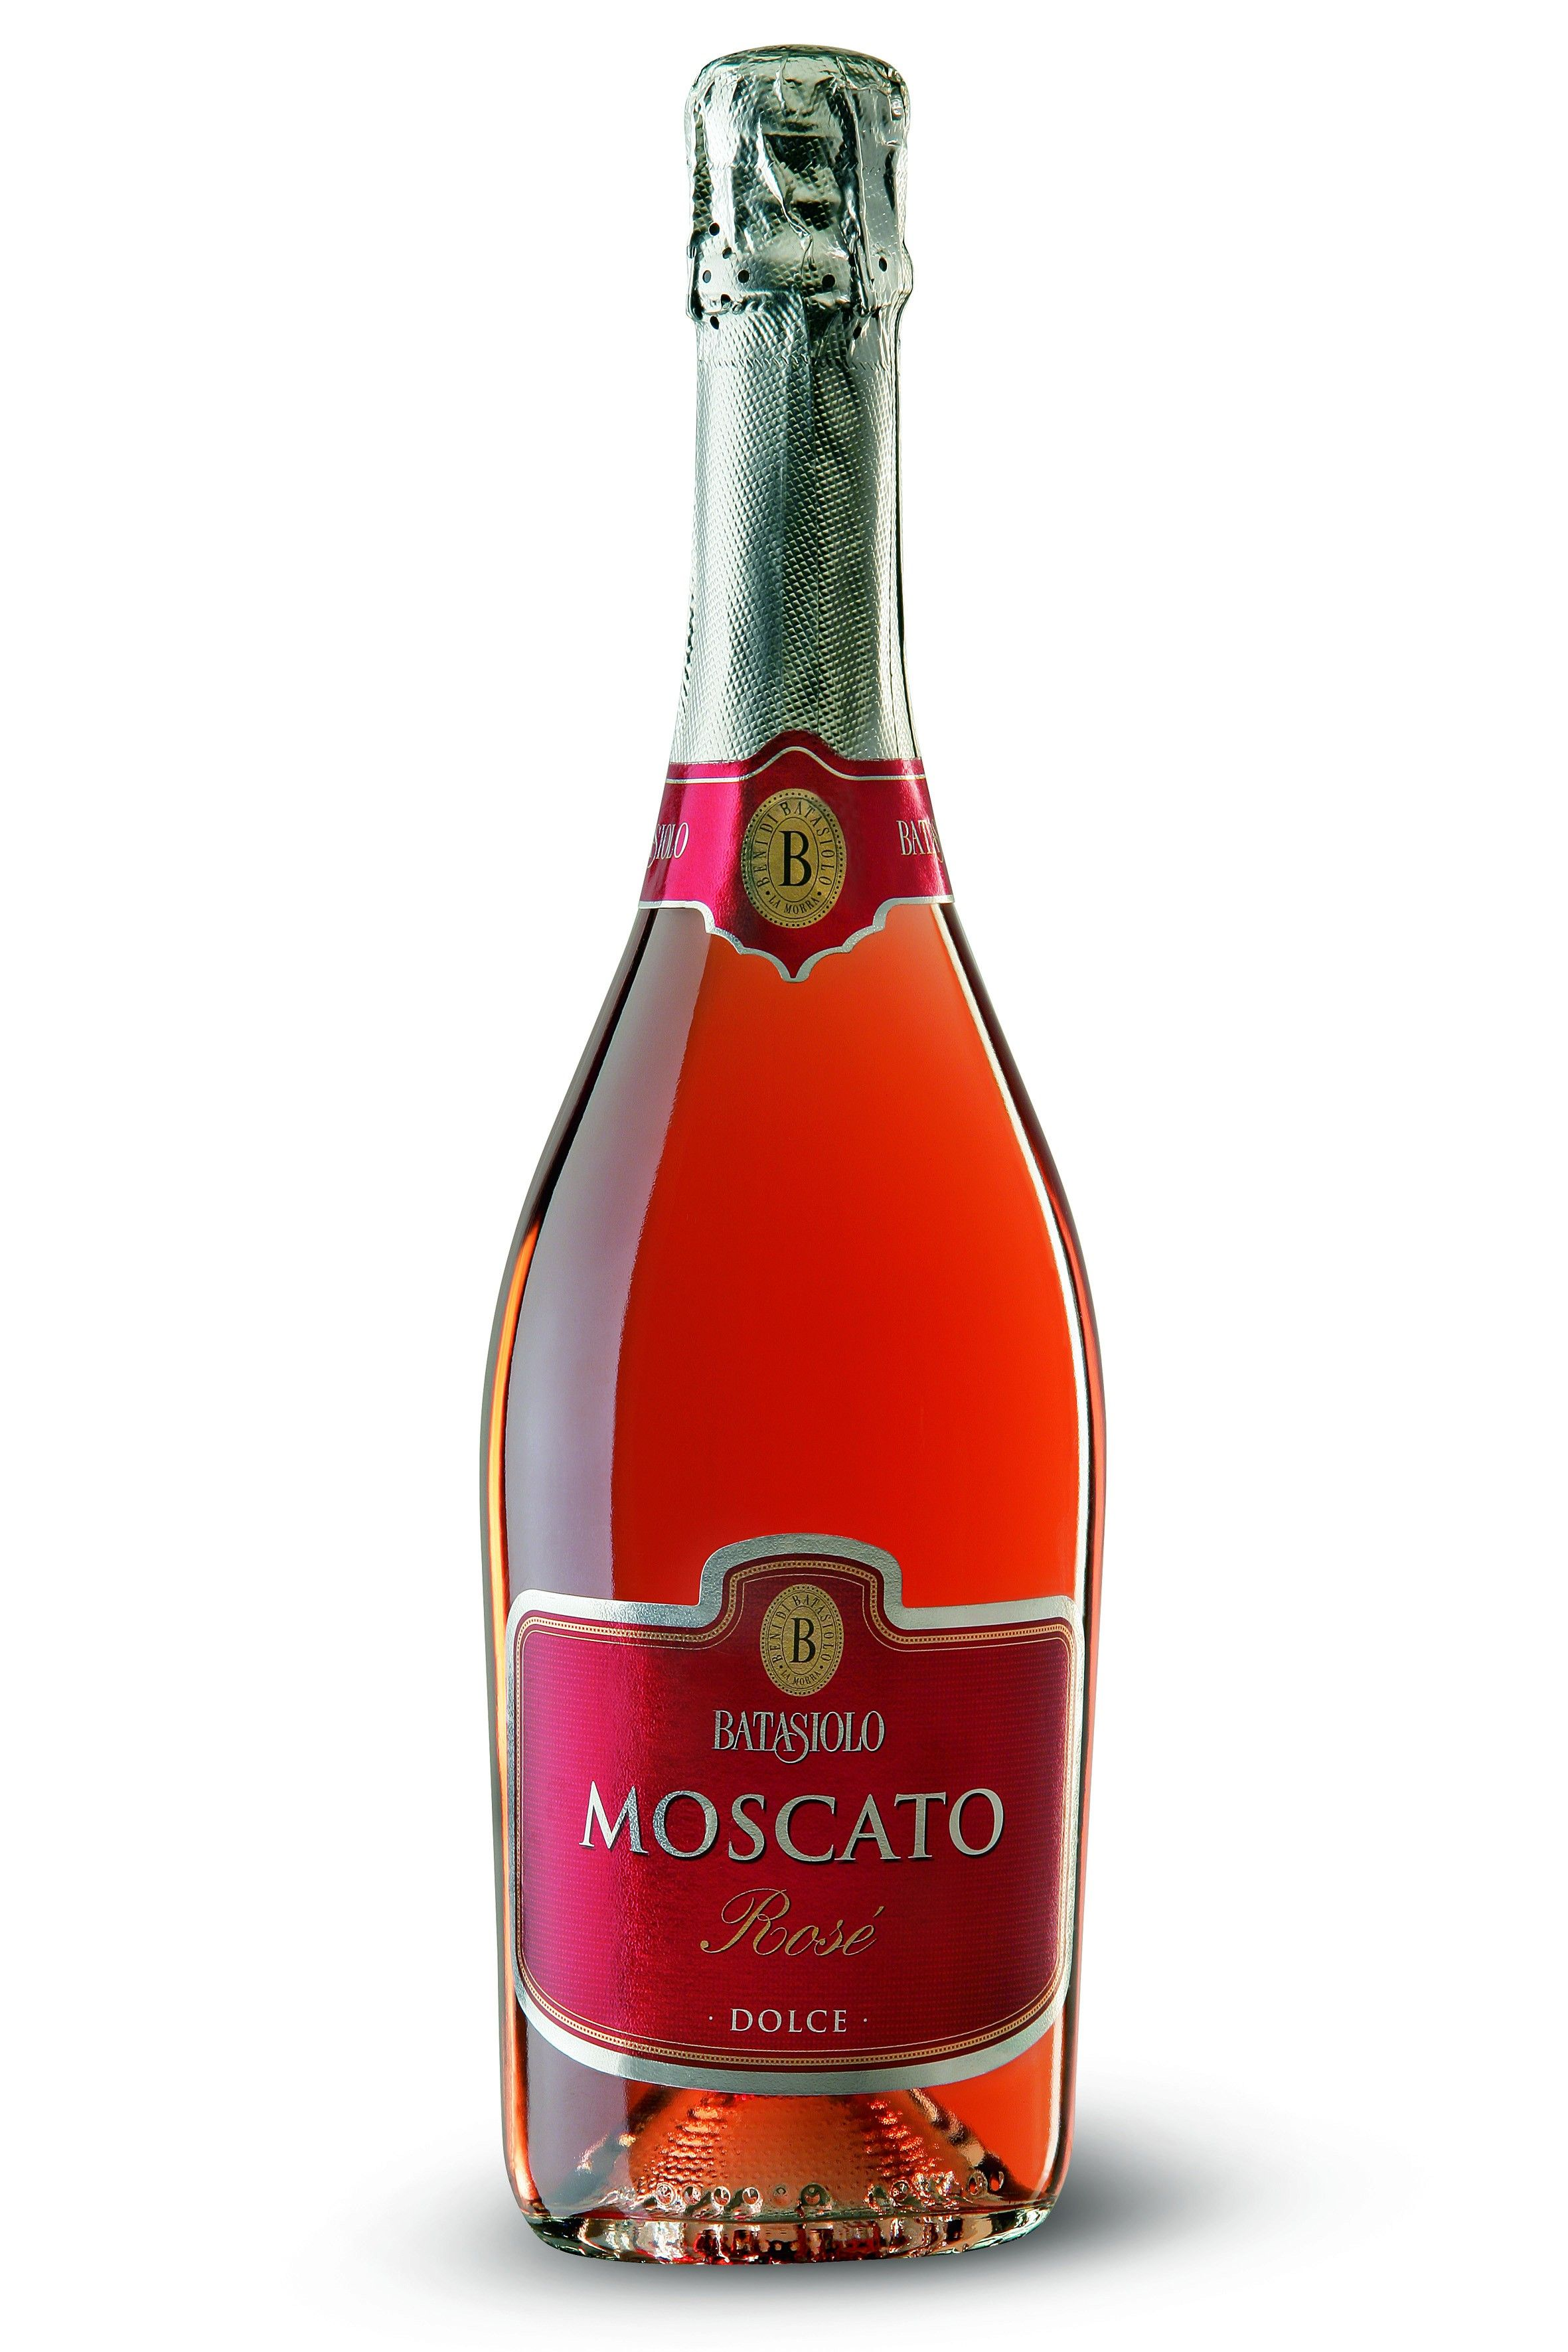 Batasiolo Moscato Spumante Rose Moscato Moscato Wine Mascoto Drinks